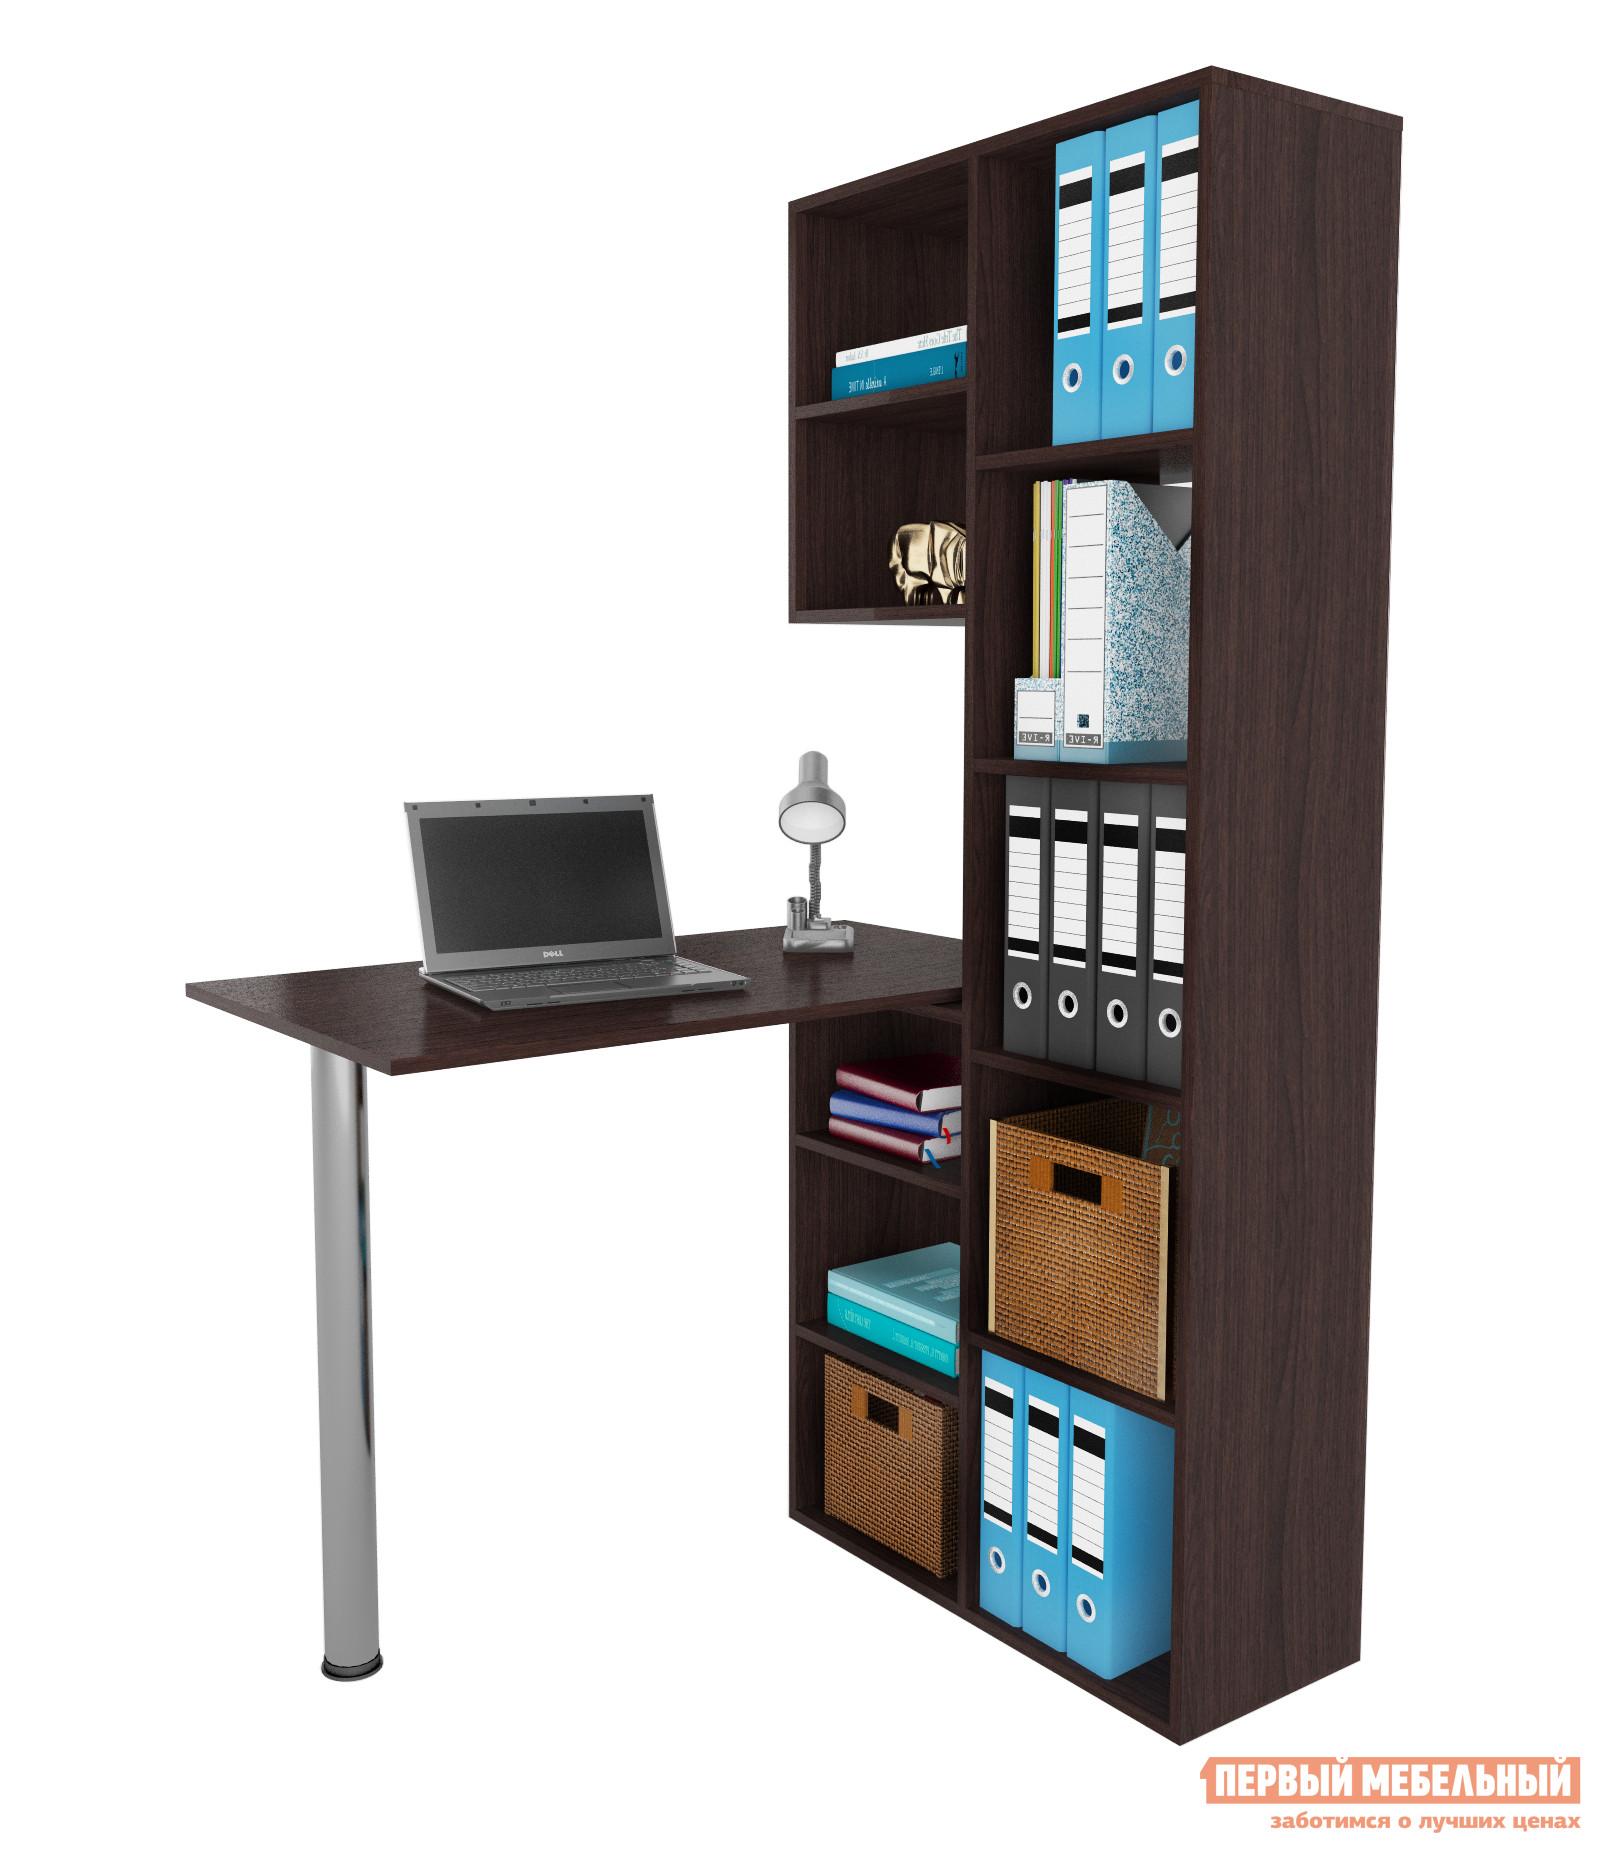 Компьютерный стол МФ Мастер Рикс-2 + Рикс-6 Венге